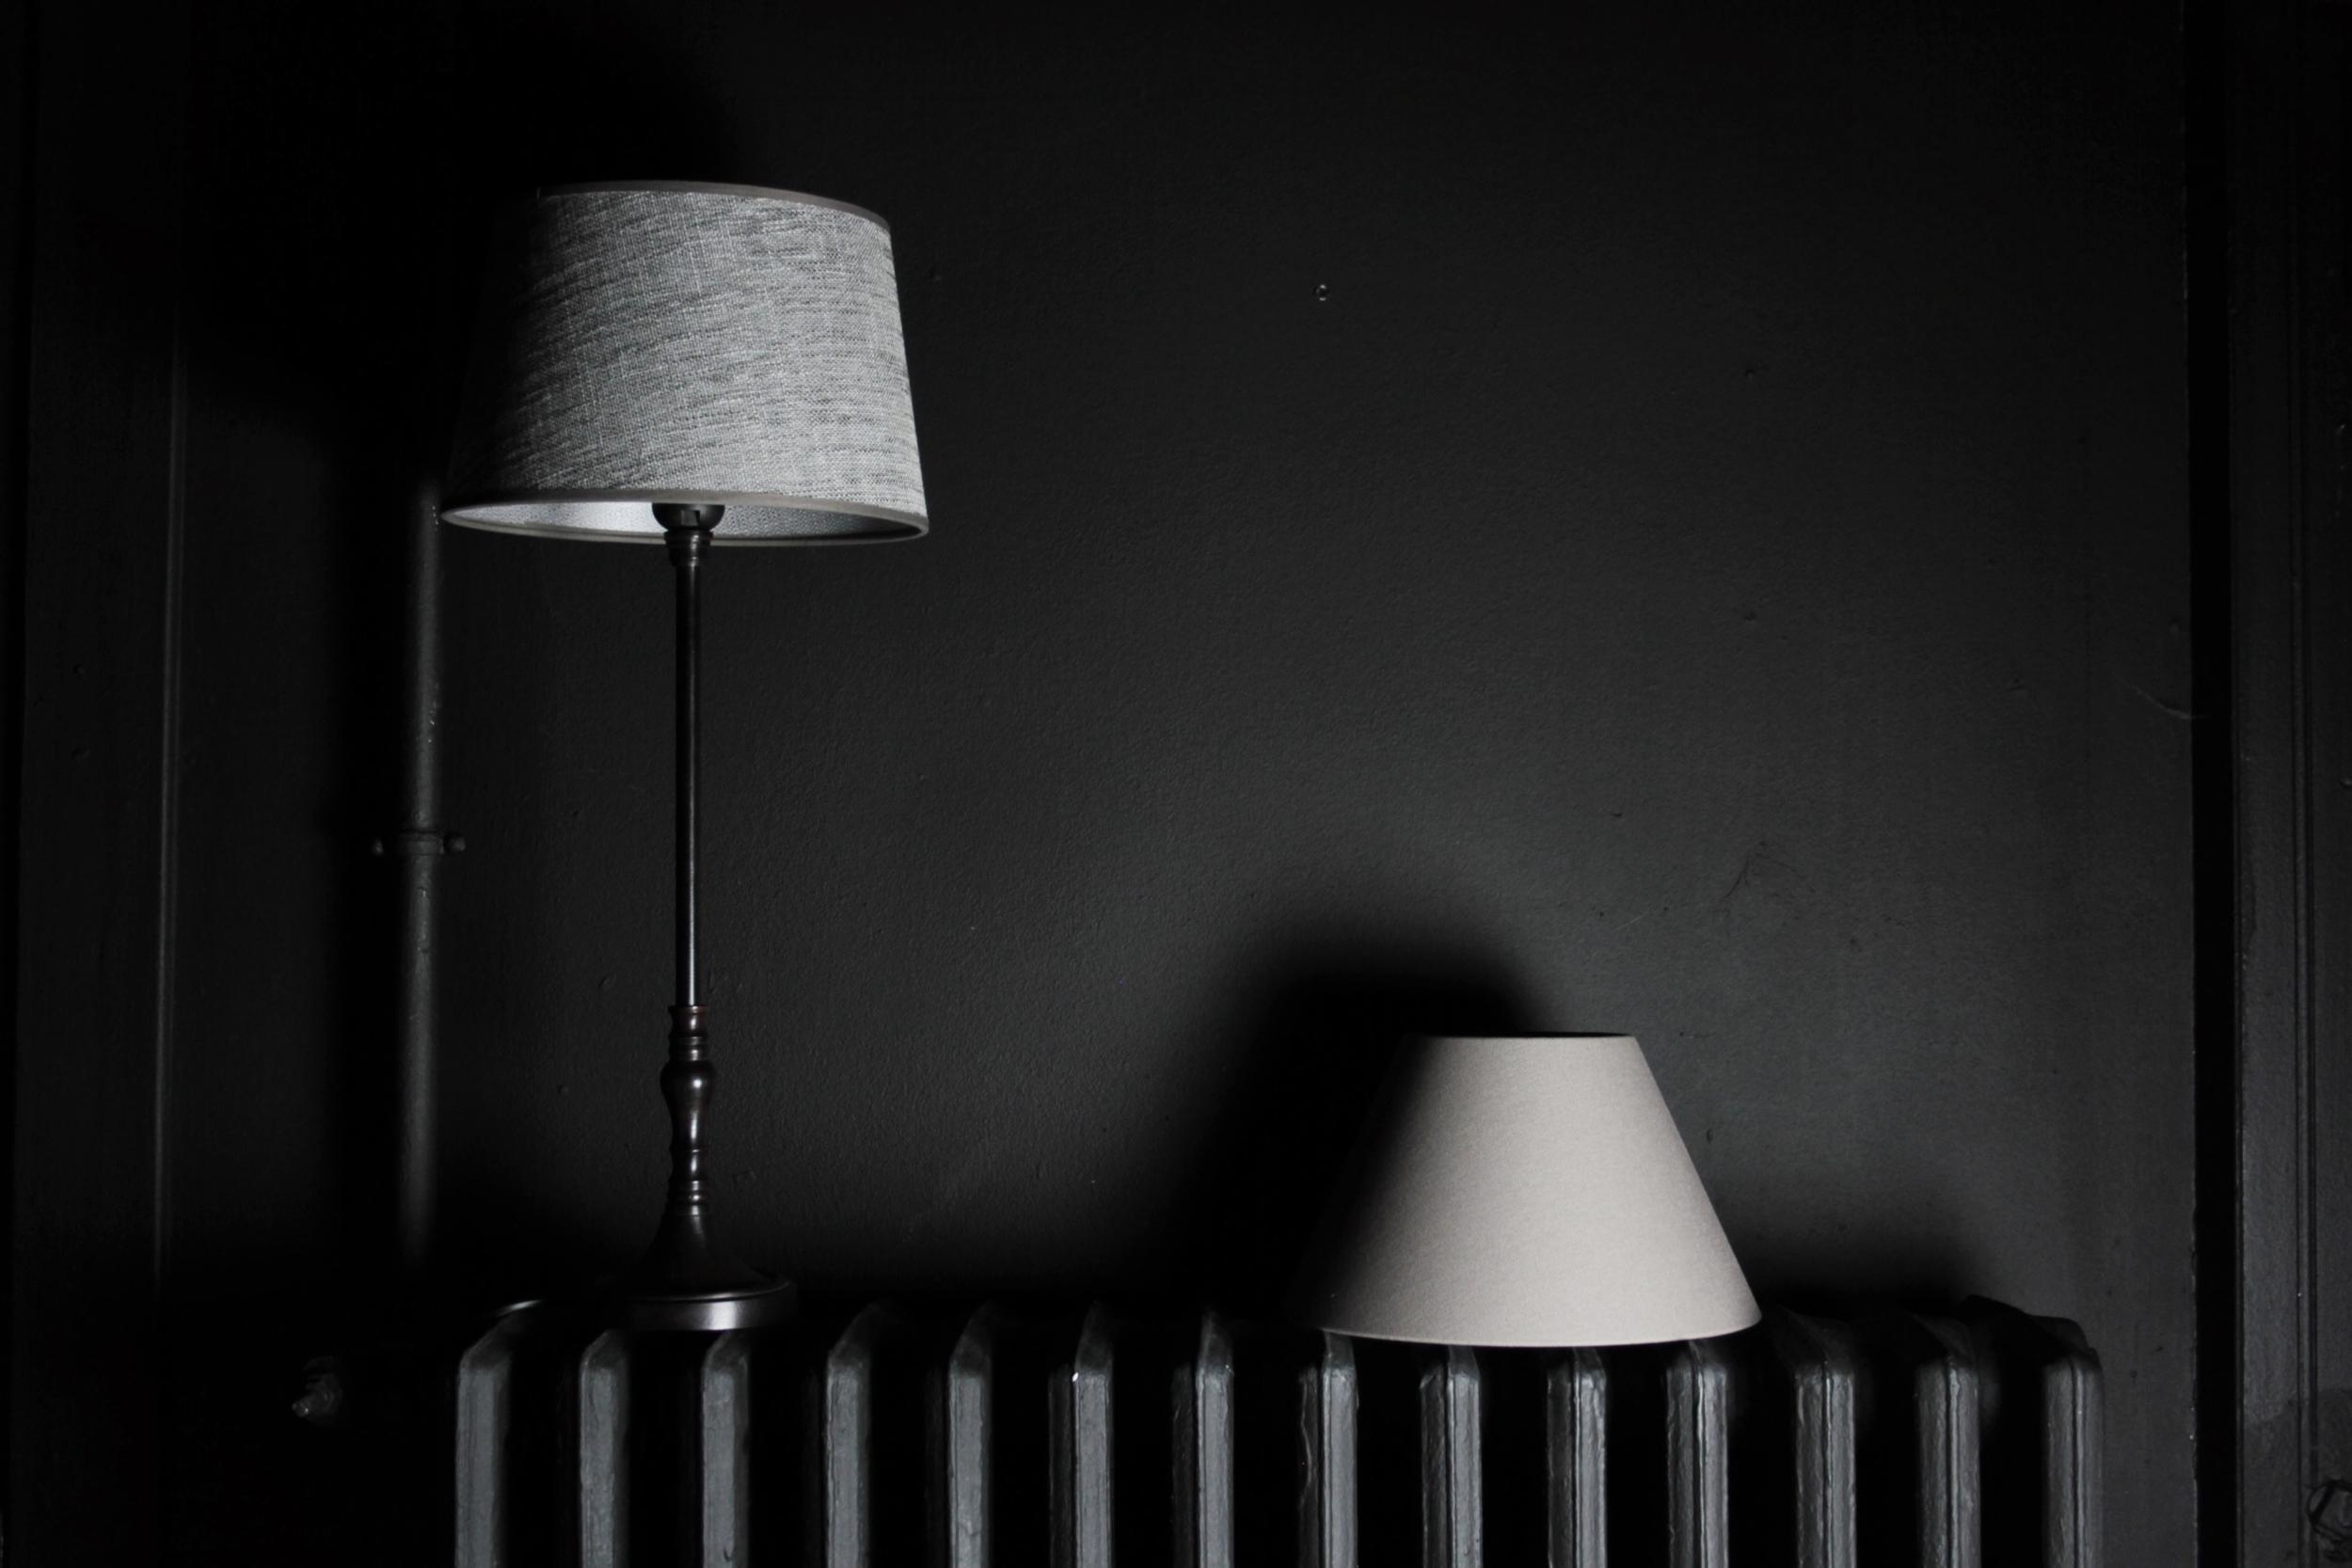 choisir son abat jour blog de e metropolight. Black Bedroom Furniture Sets. Home Design Ideas